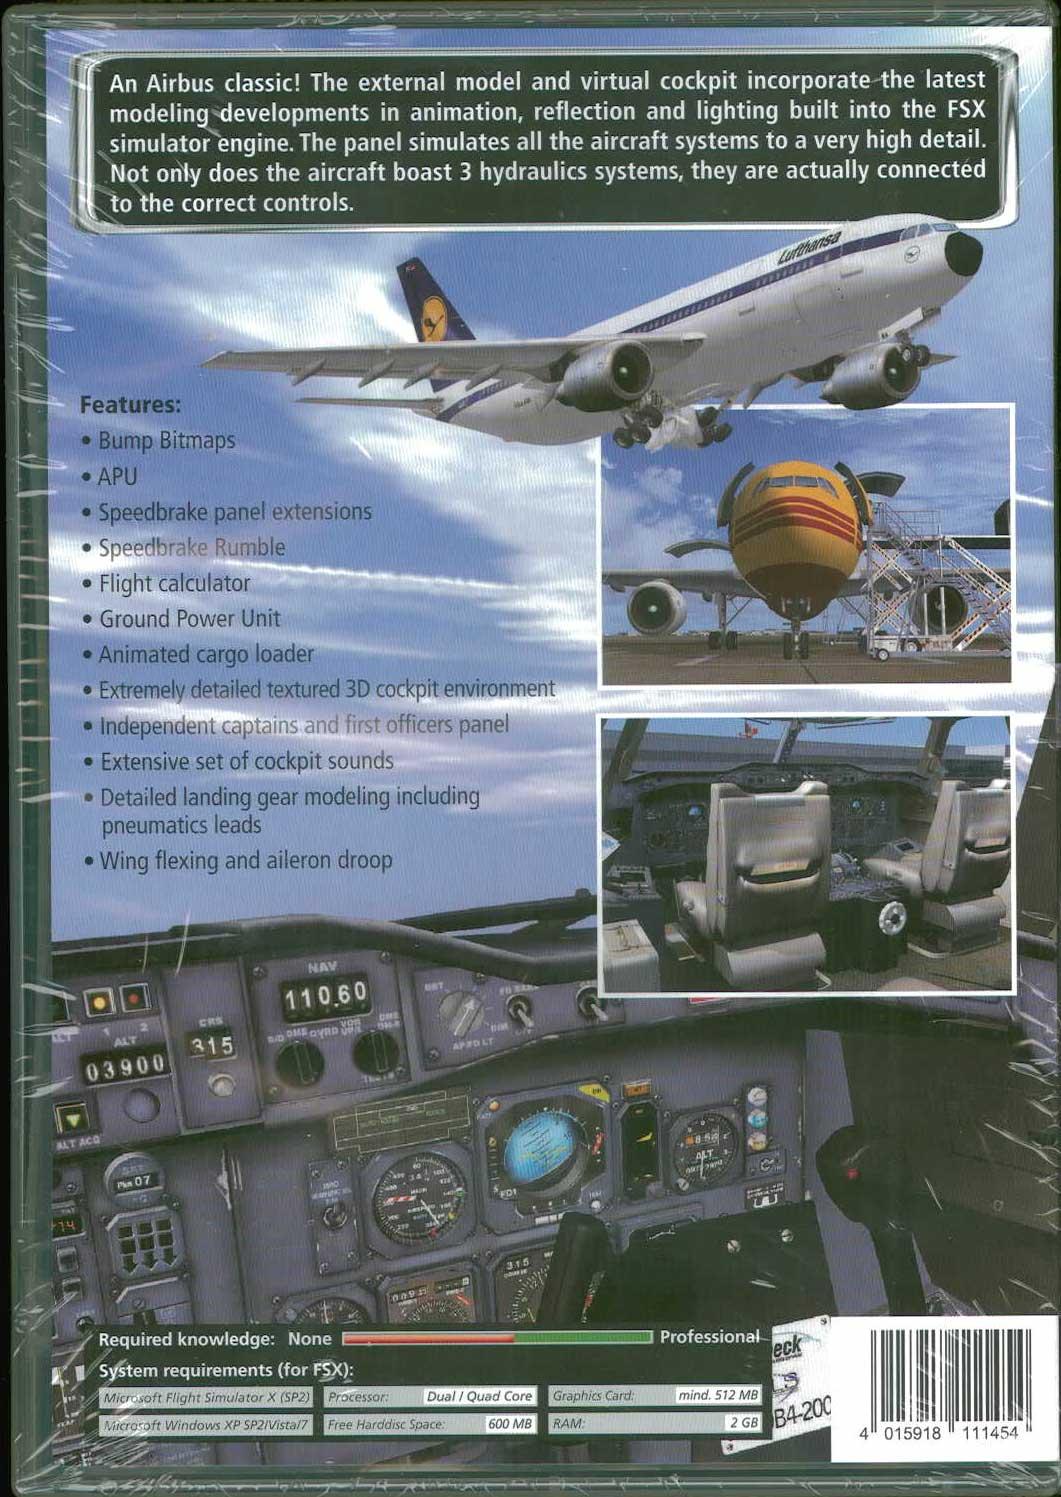 SimCheck Airbus A300 B4-200 (FSX) - ショップKoin (ShopKoin)